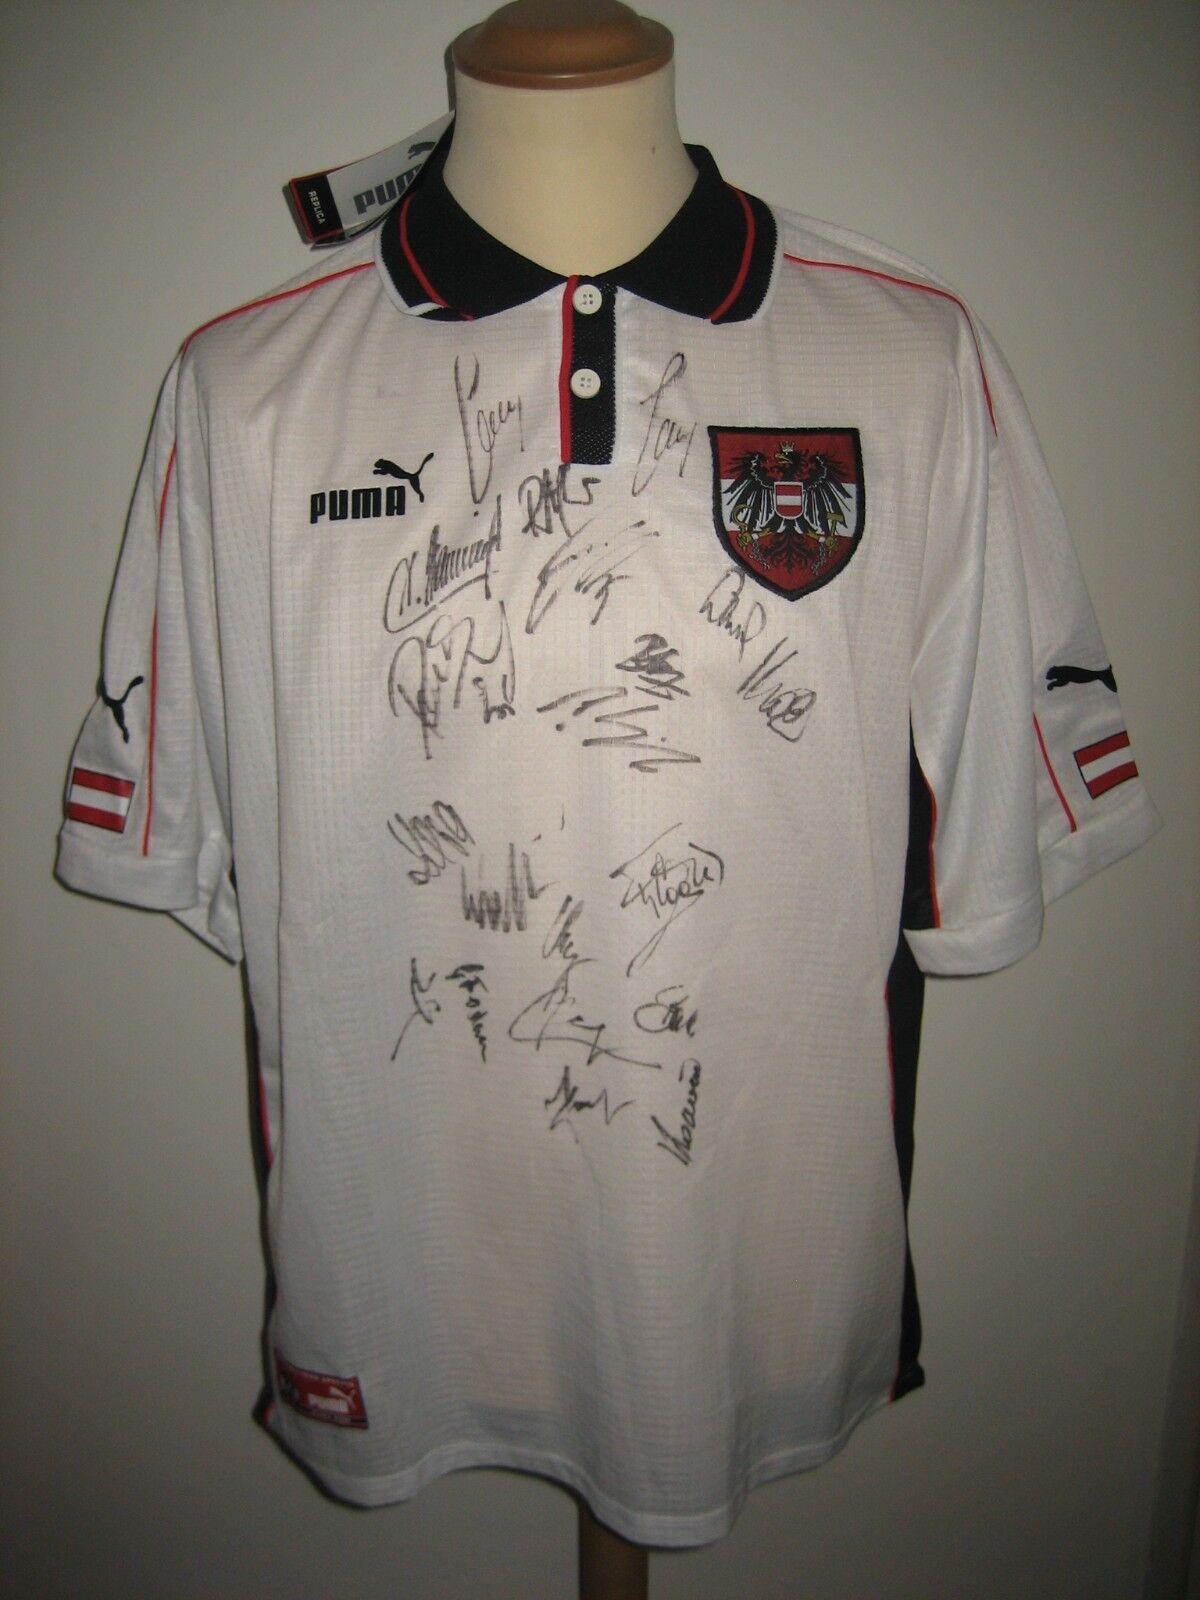 Autria SIGNED Osterreich football shirt soccer jersey trikot fussball Dimensione XL